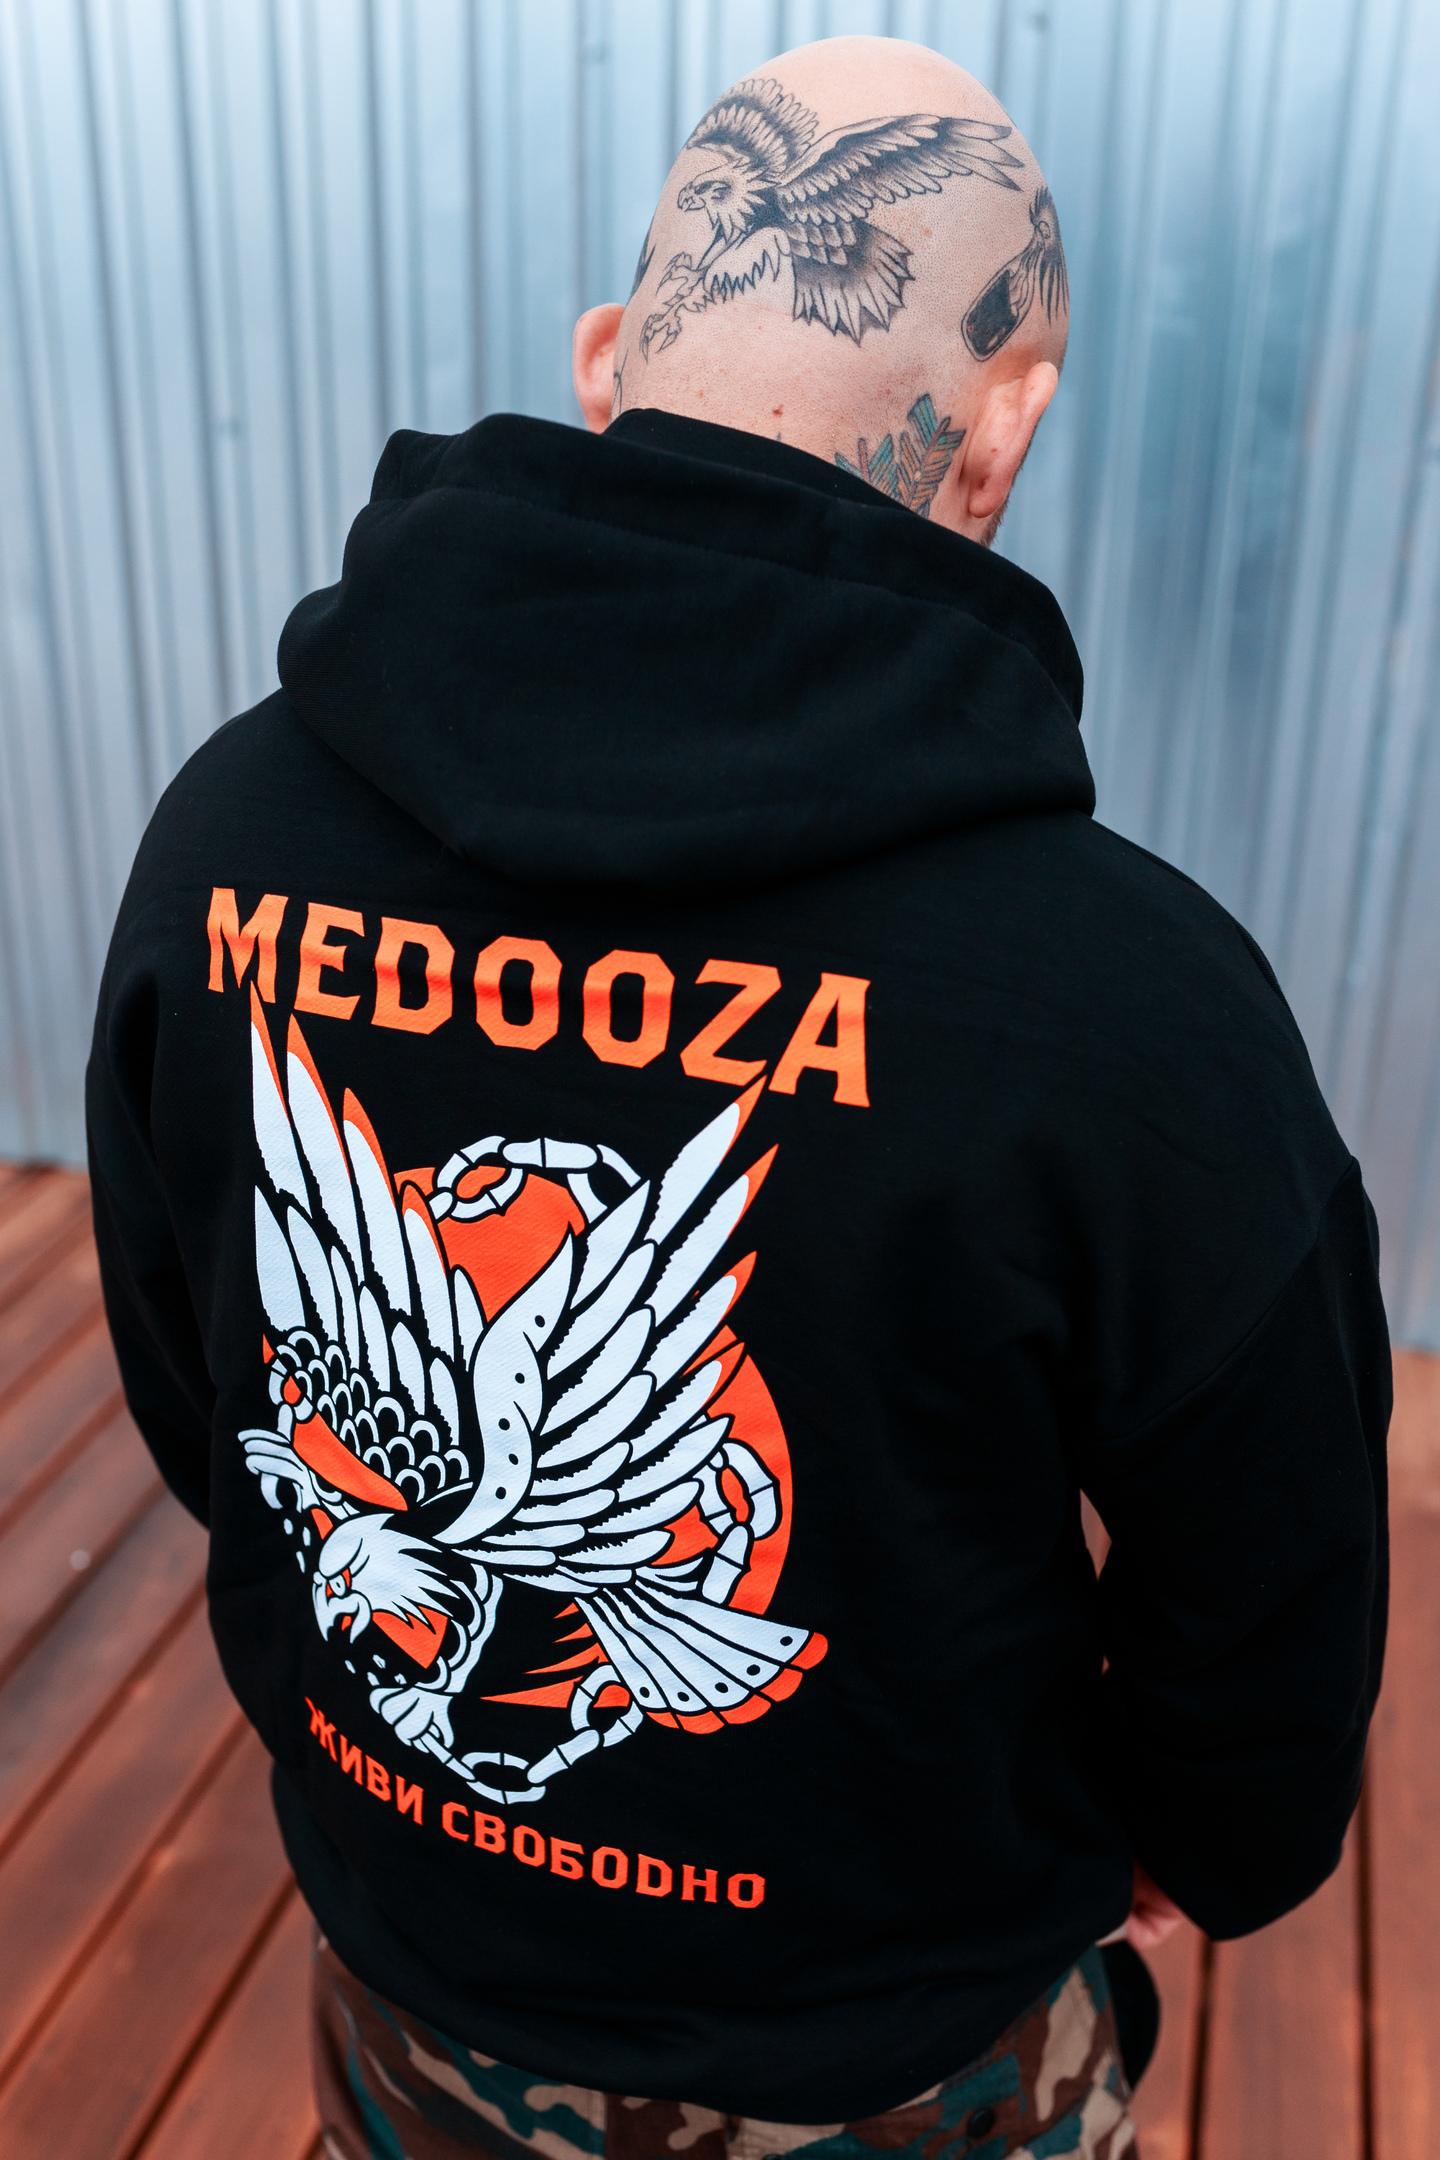 meduza свобода